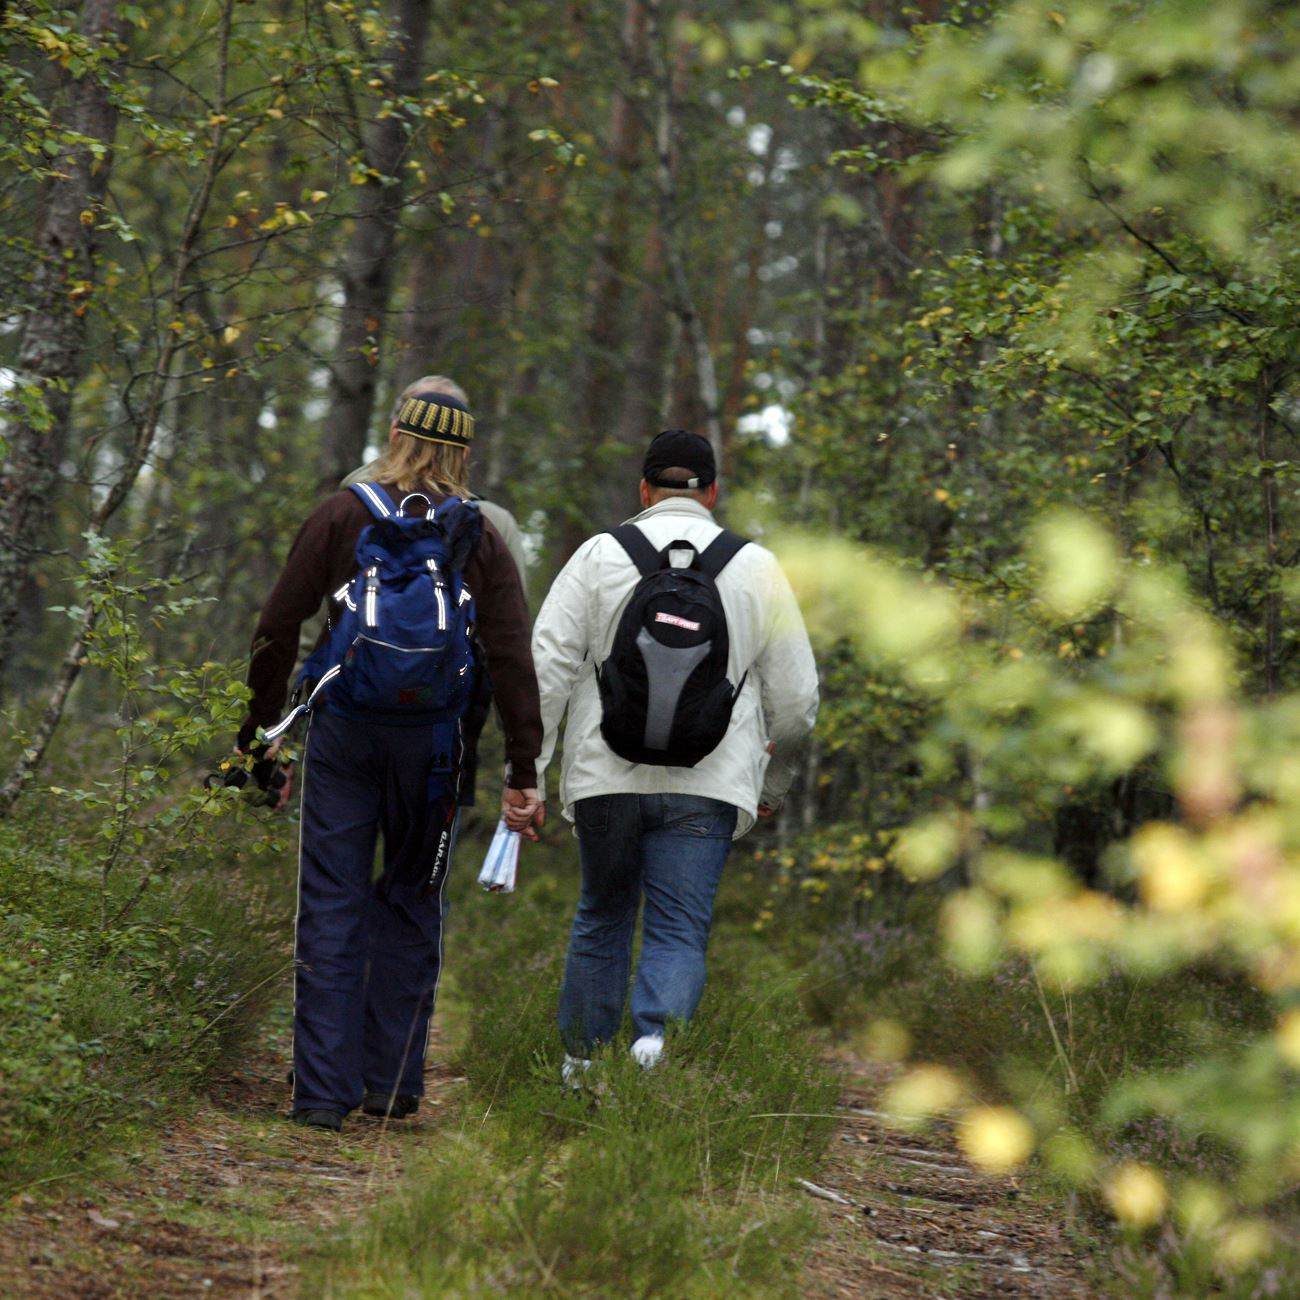 Smålandsbilder.se,  © Värnamo Näringsliv AB , Wandern Sie auf den alten Pilgerwegen